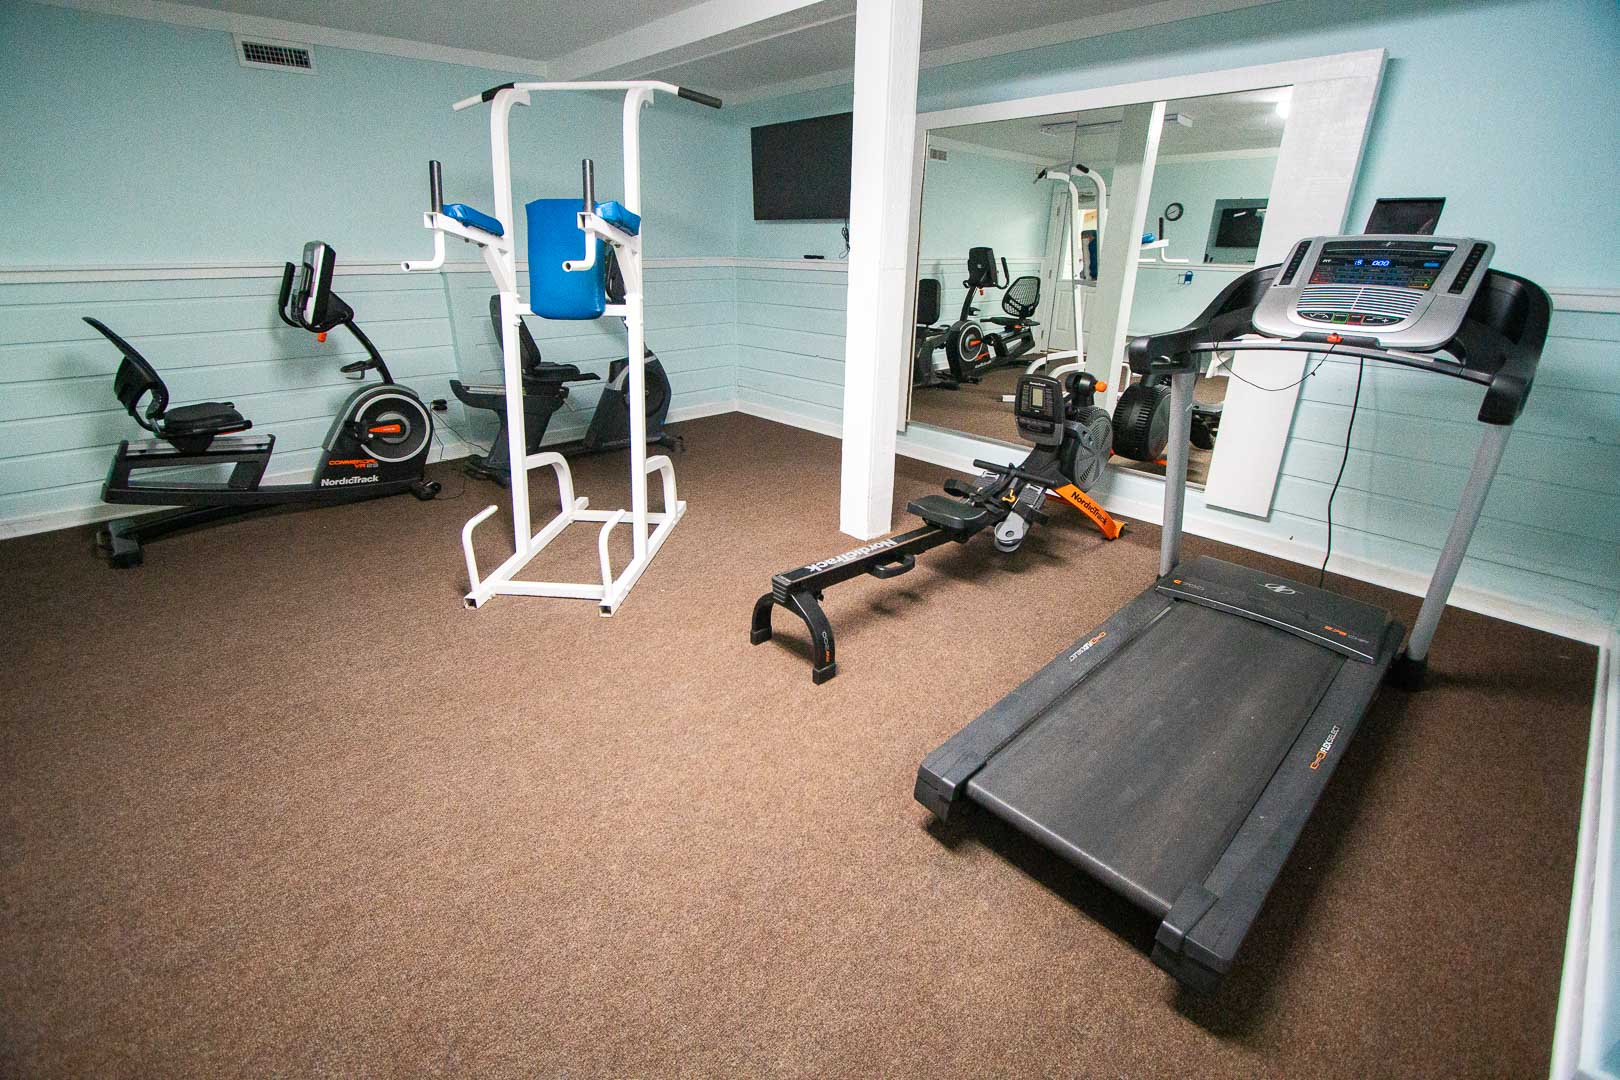 An indoor gym at VRI's Barrier Island Station in North Carolina.